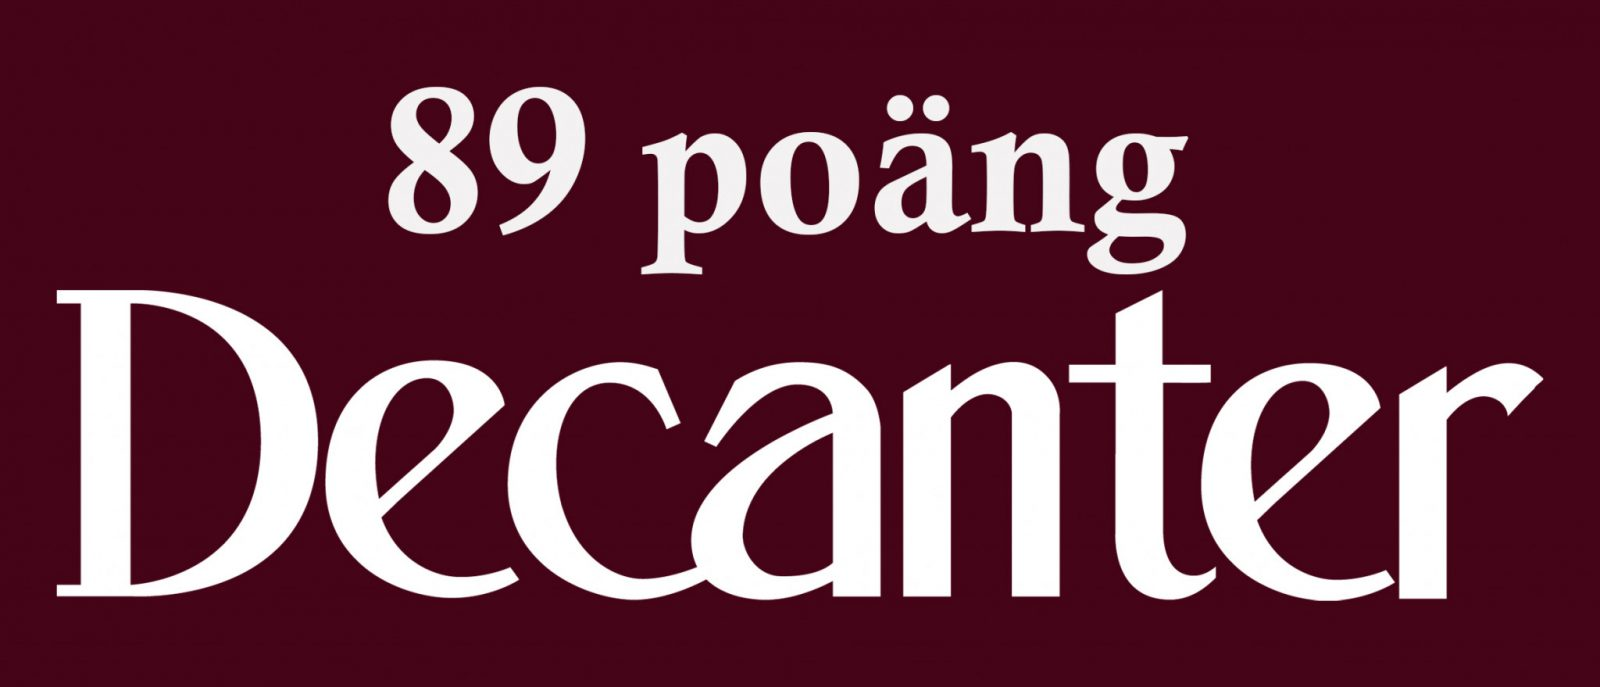 Decanter_89